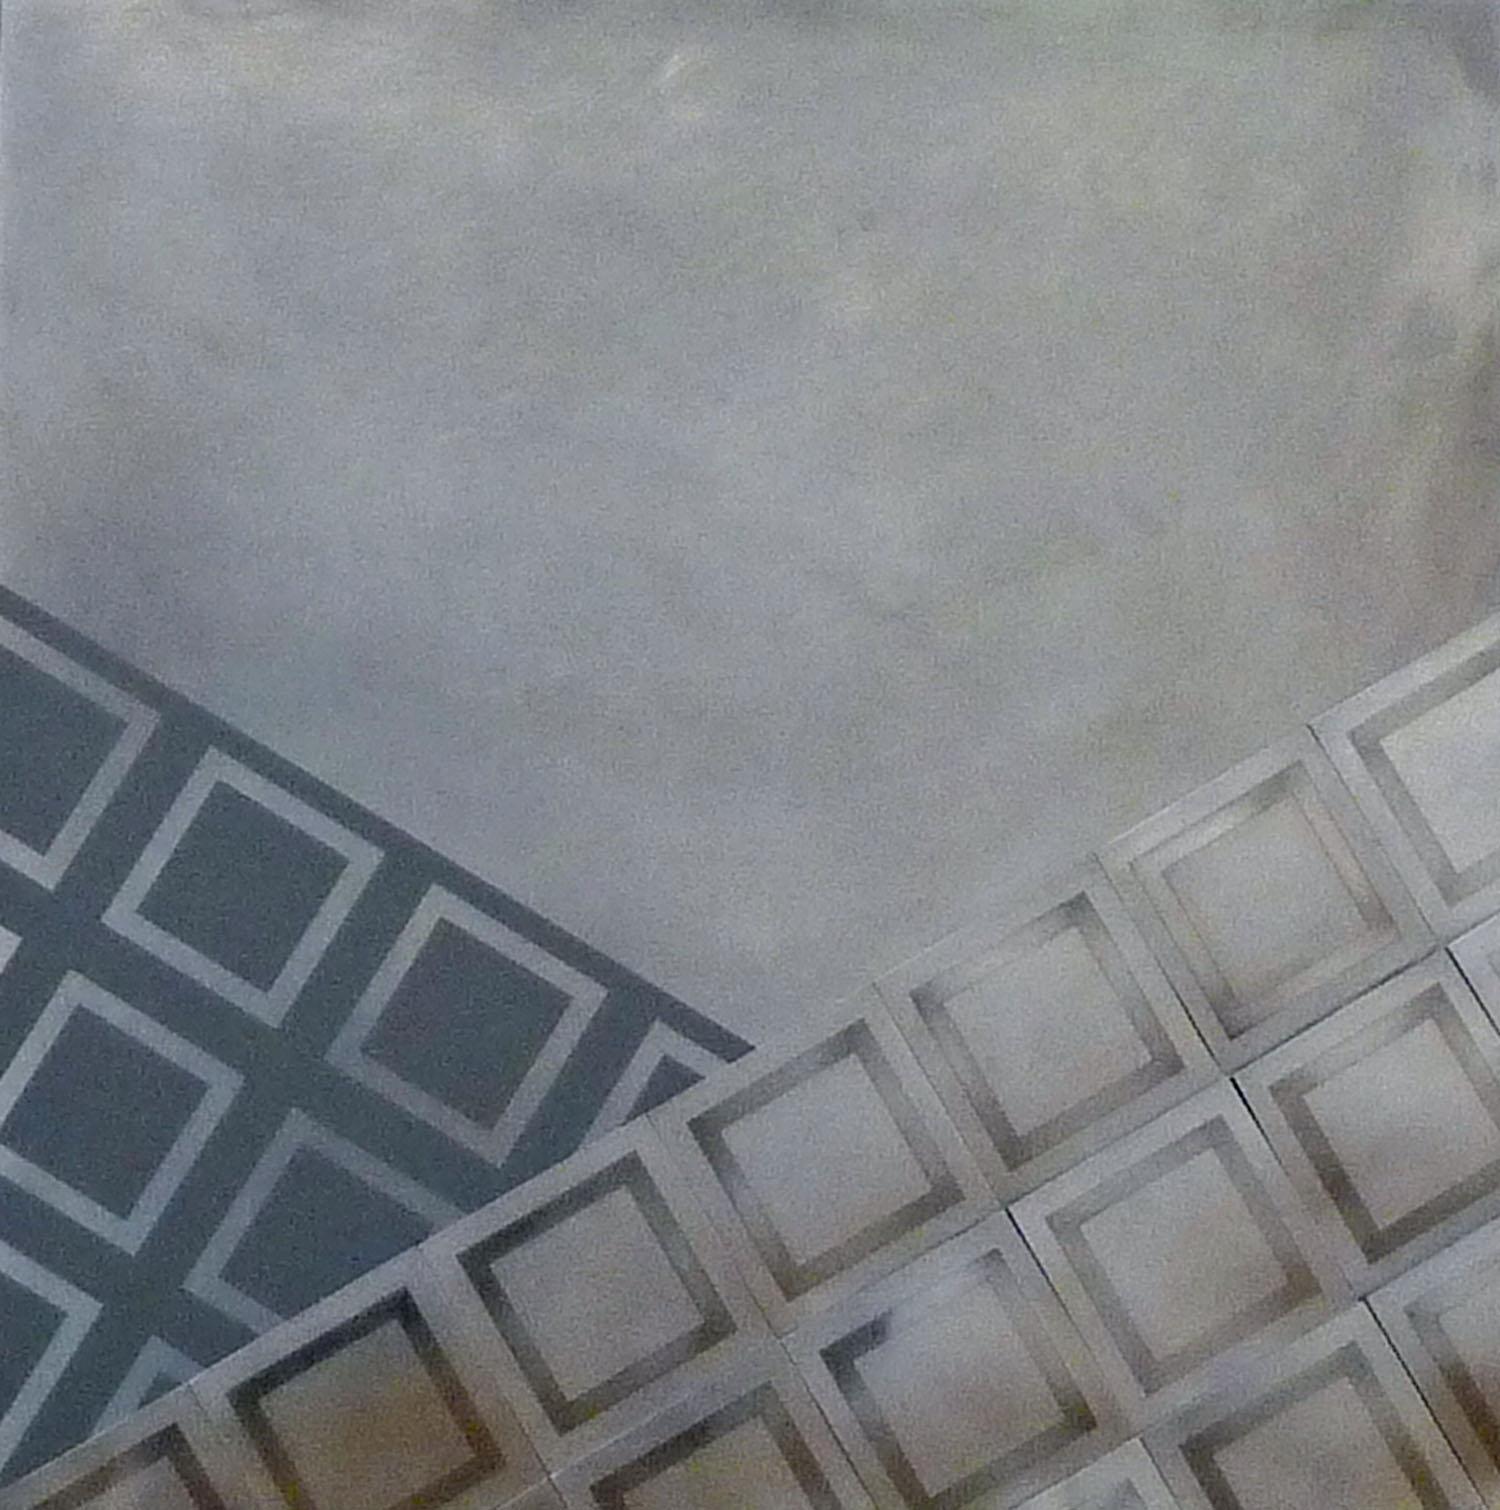 Brian King_-_Mirage_aluminium_61.5 x 61.5cm.jpg